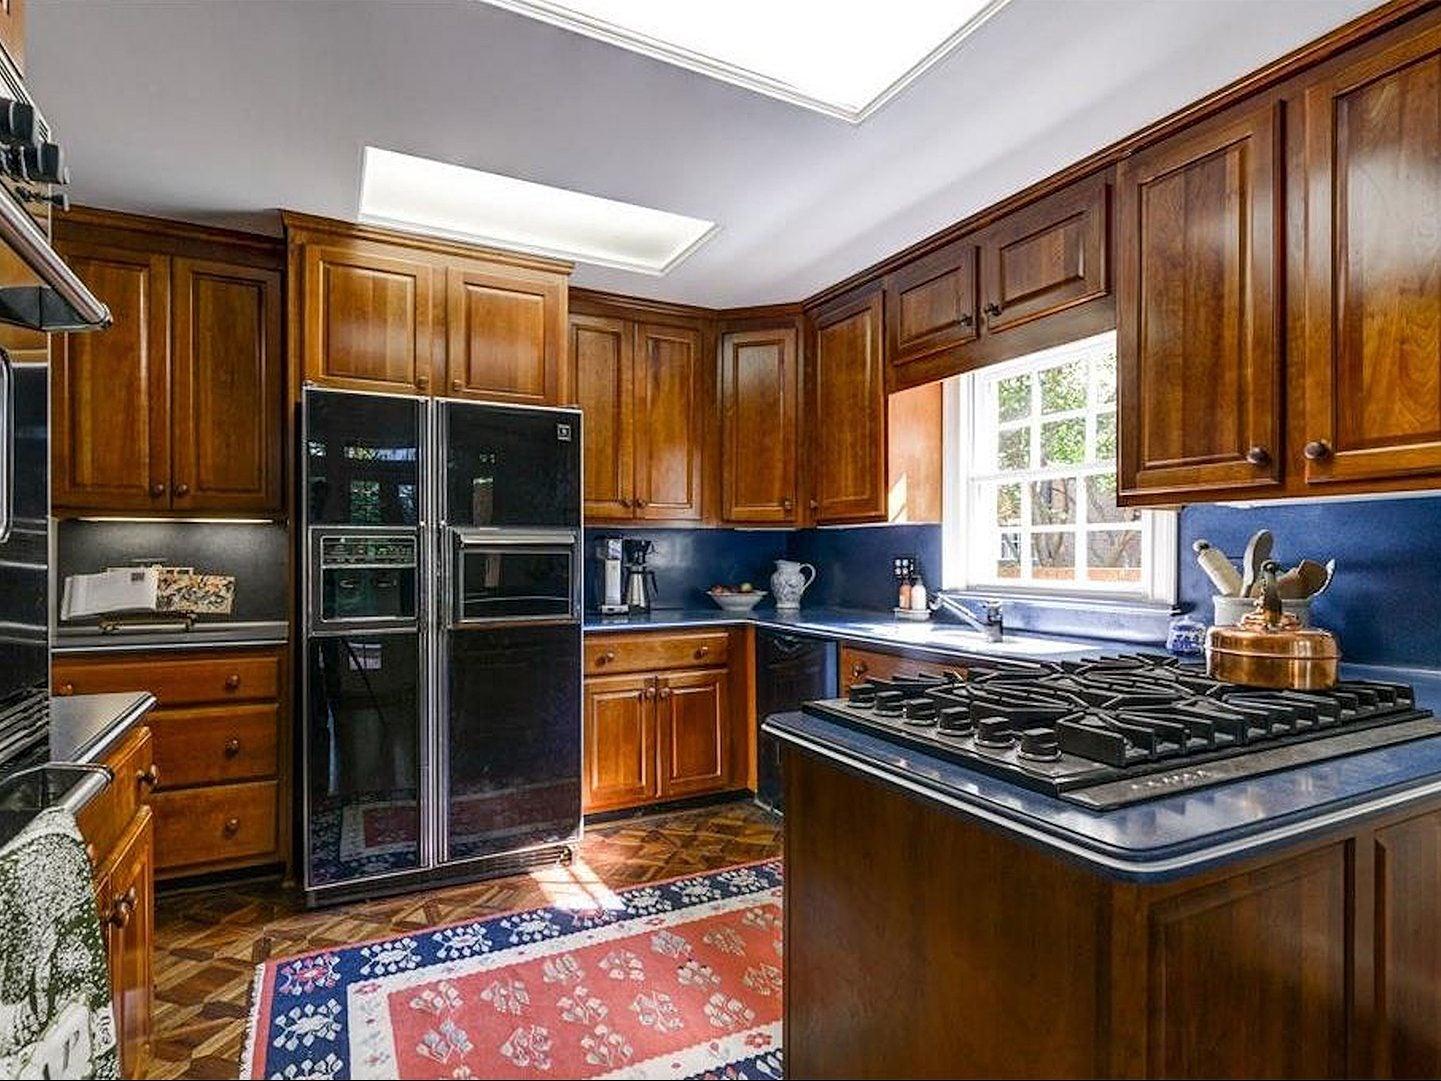 '80s kitchen before